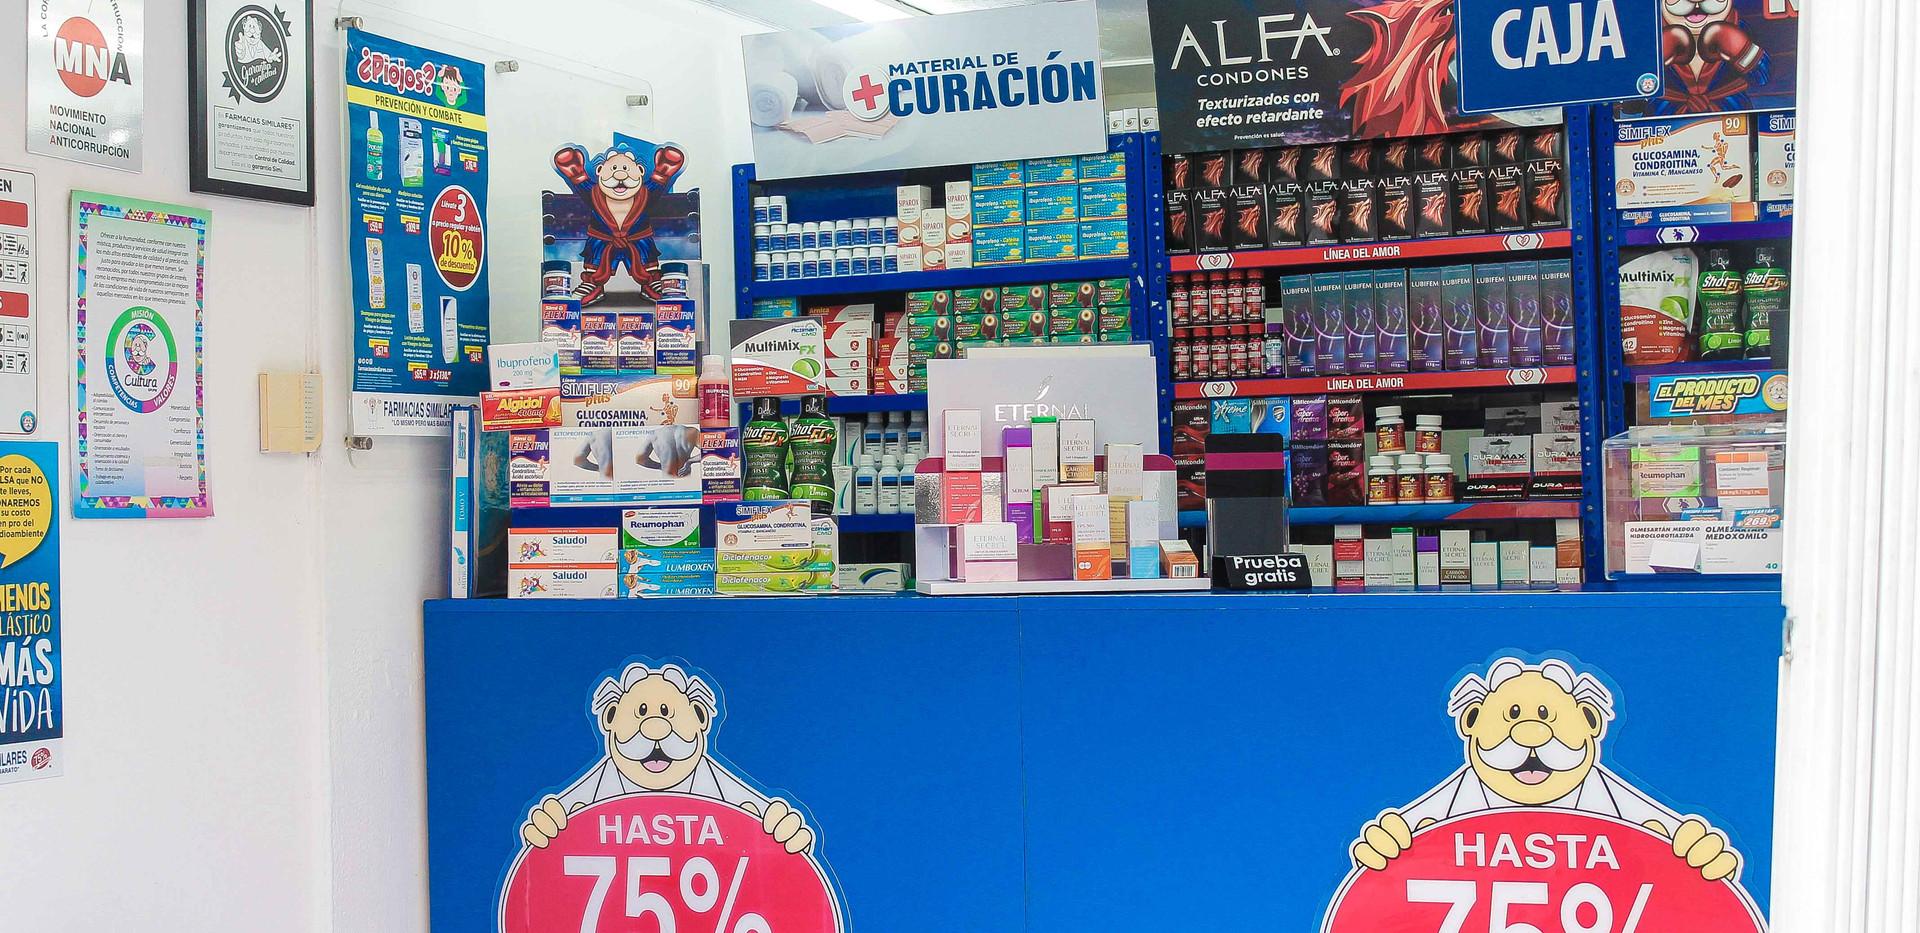 FarmaciasSimilares-tasteofisla-islamujer